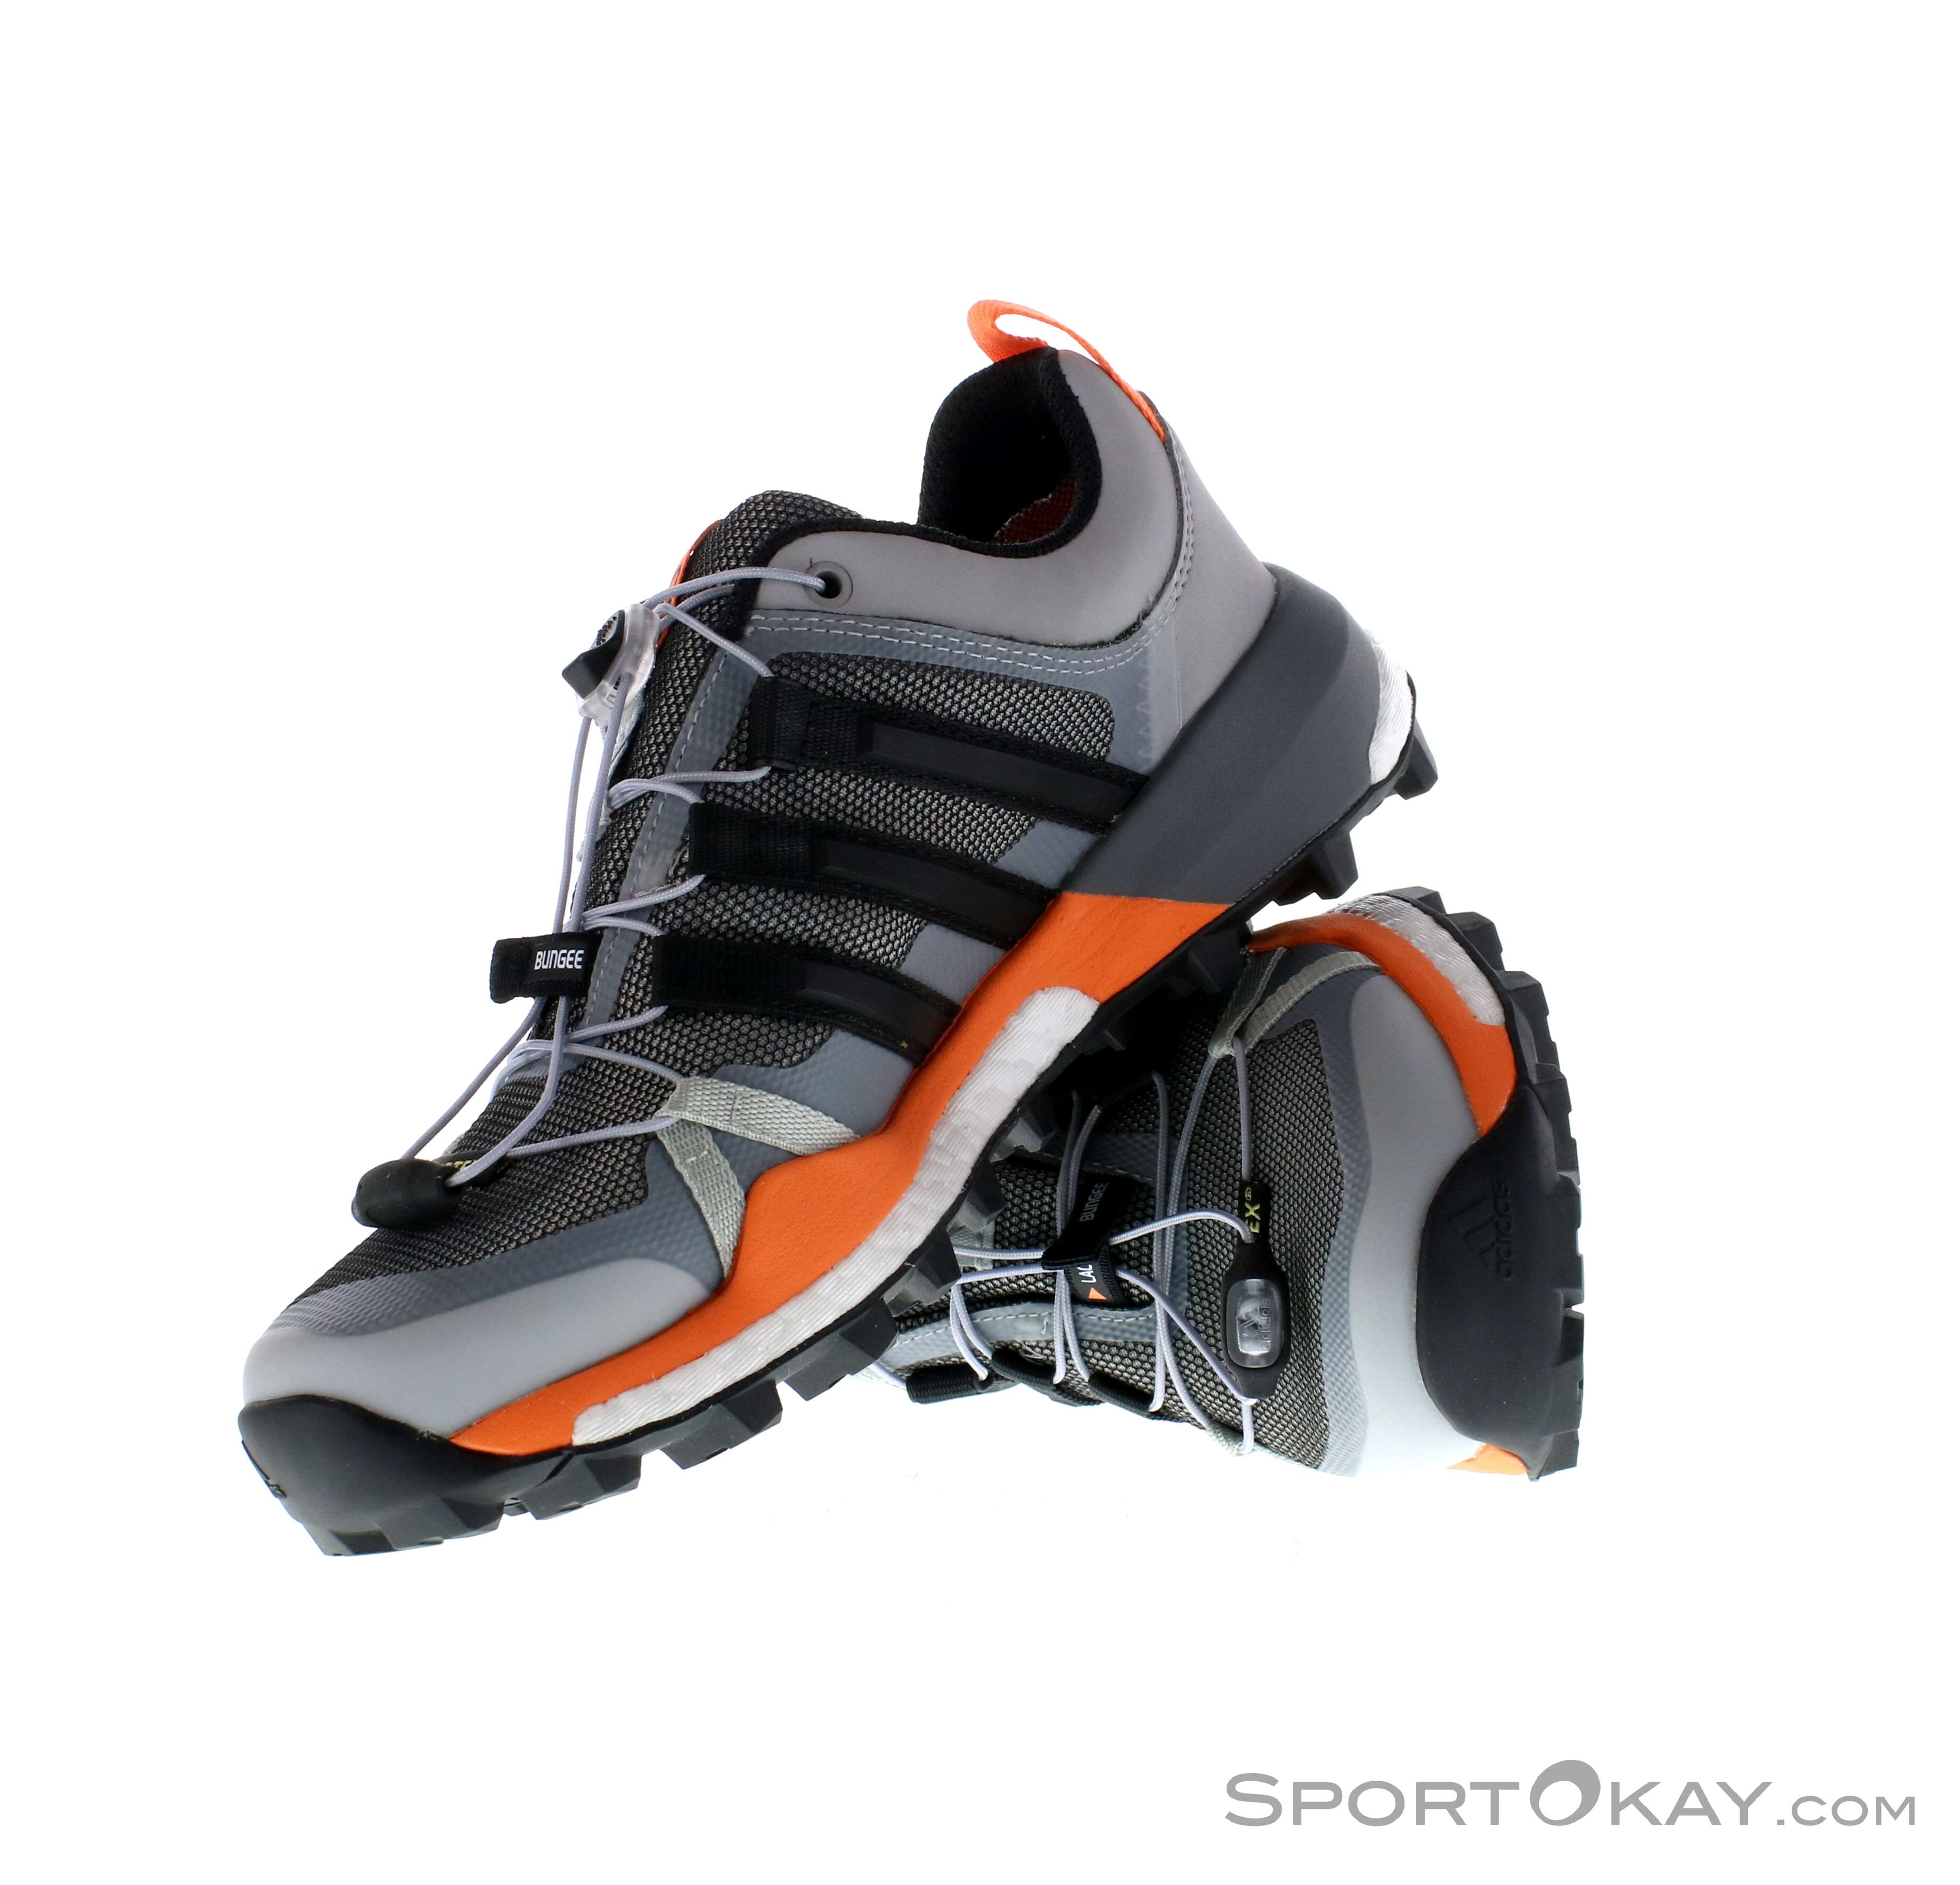 competitive price c3306 bbd02 adidas Terrex Skychaser GTX Damen Traillaufschuhe Gore-Tex, adidas, Grau, ,  Damen